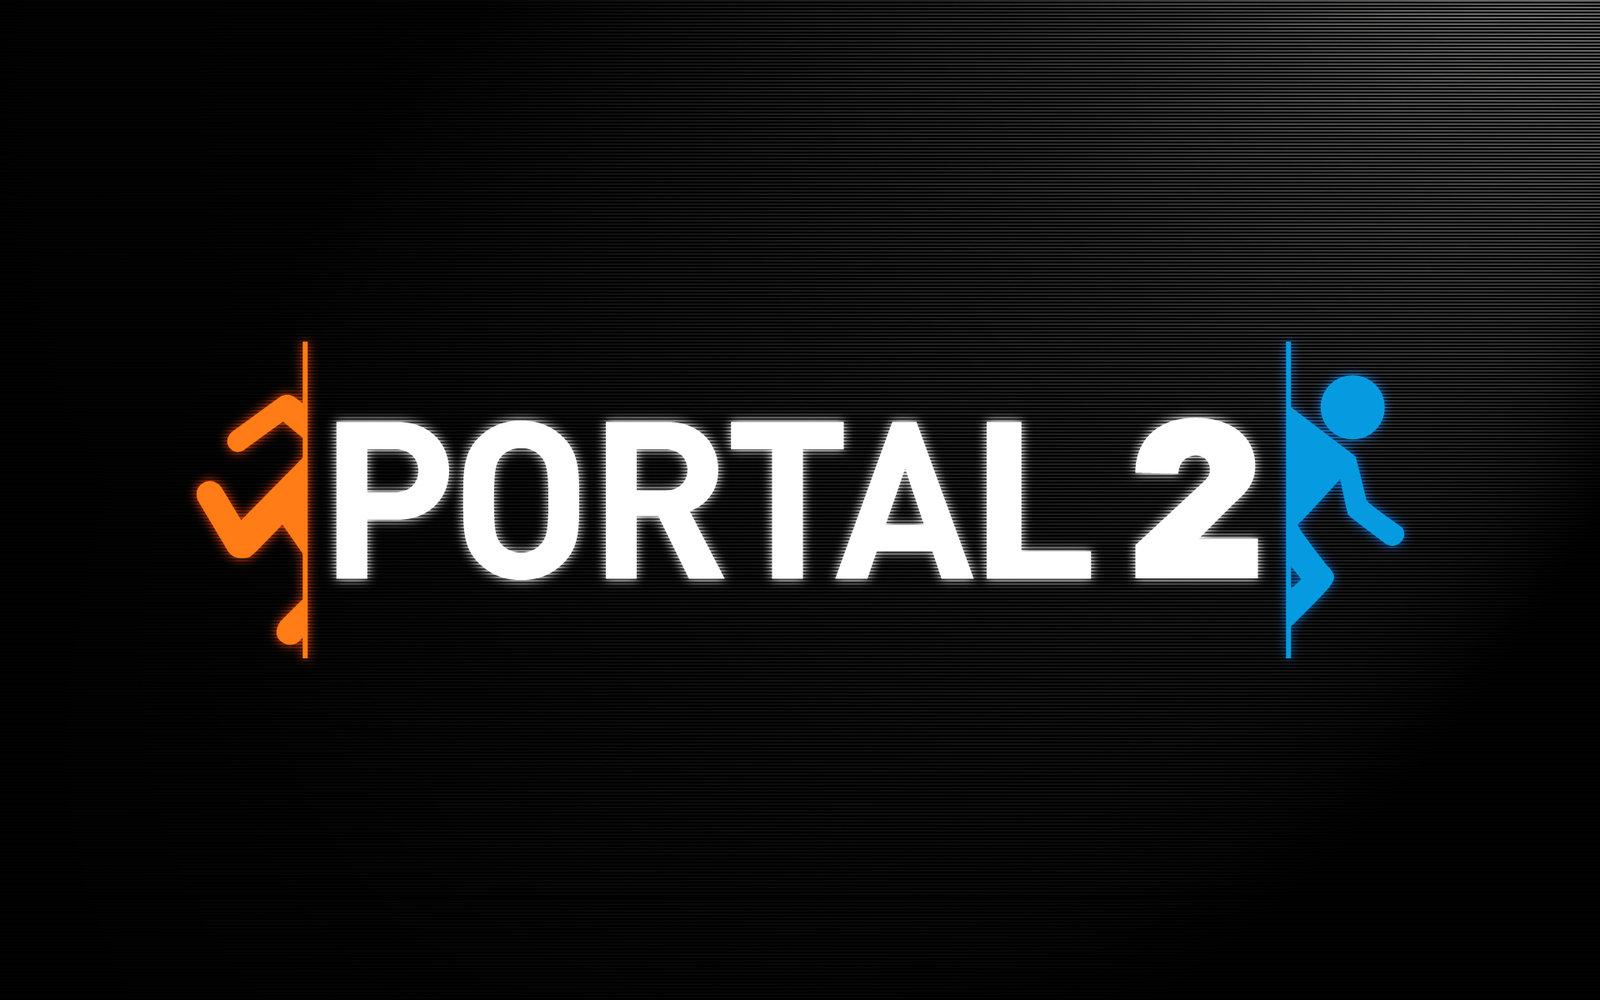 Portal 2 Wallpaper by Zeptozephyr 1600x1000